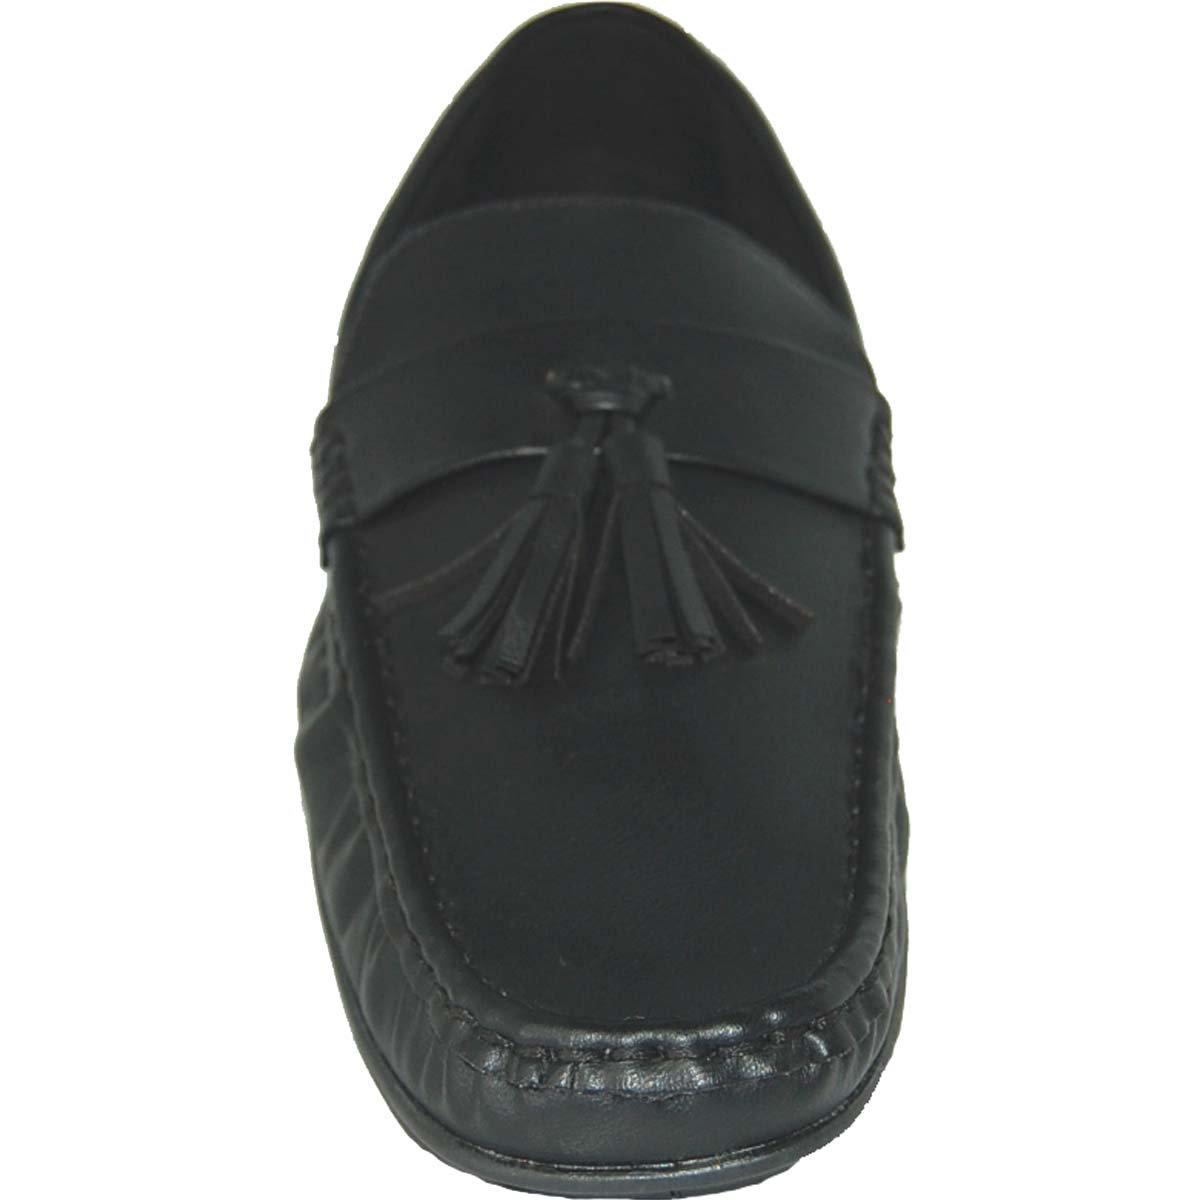 KRAZY SHOE ARTISTS Shoe Artists Loafer Tassel Men in Black